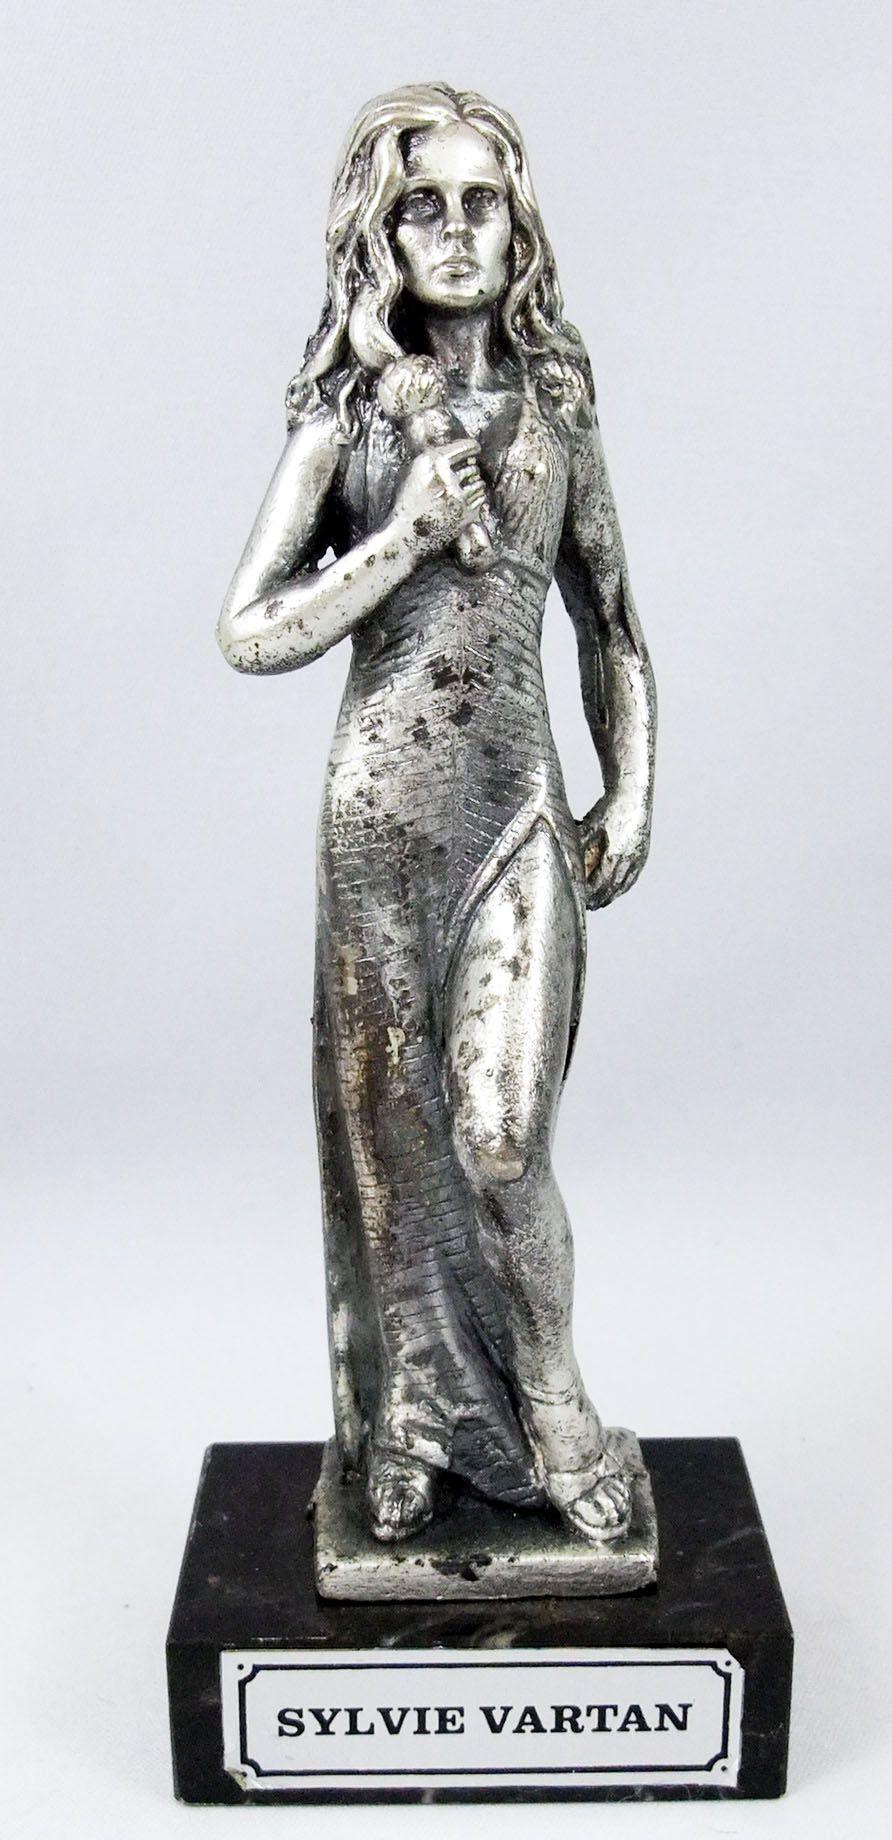 "Sylvie Vartan - 6\"" die-cast métal statue - Daviland France 1978"